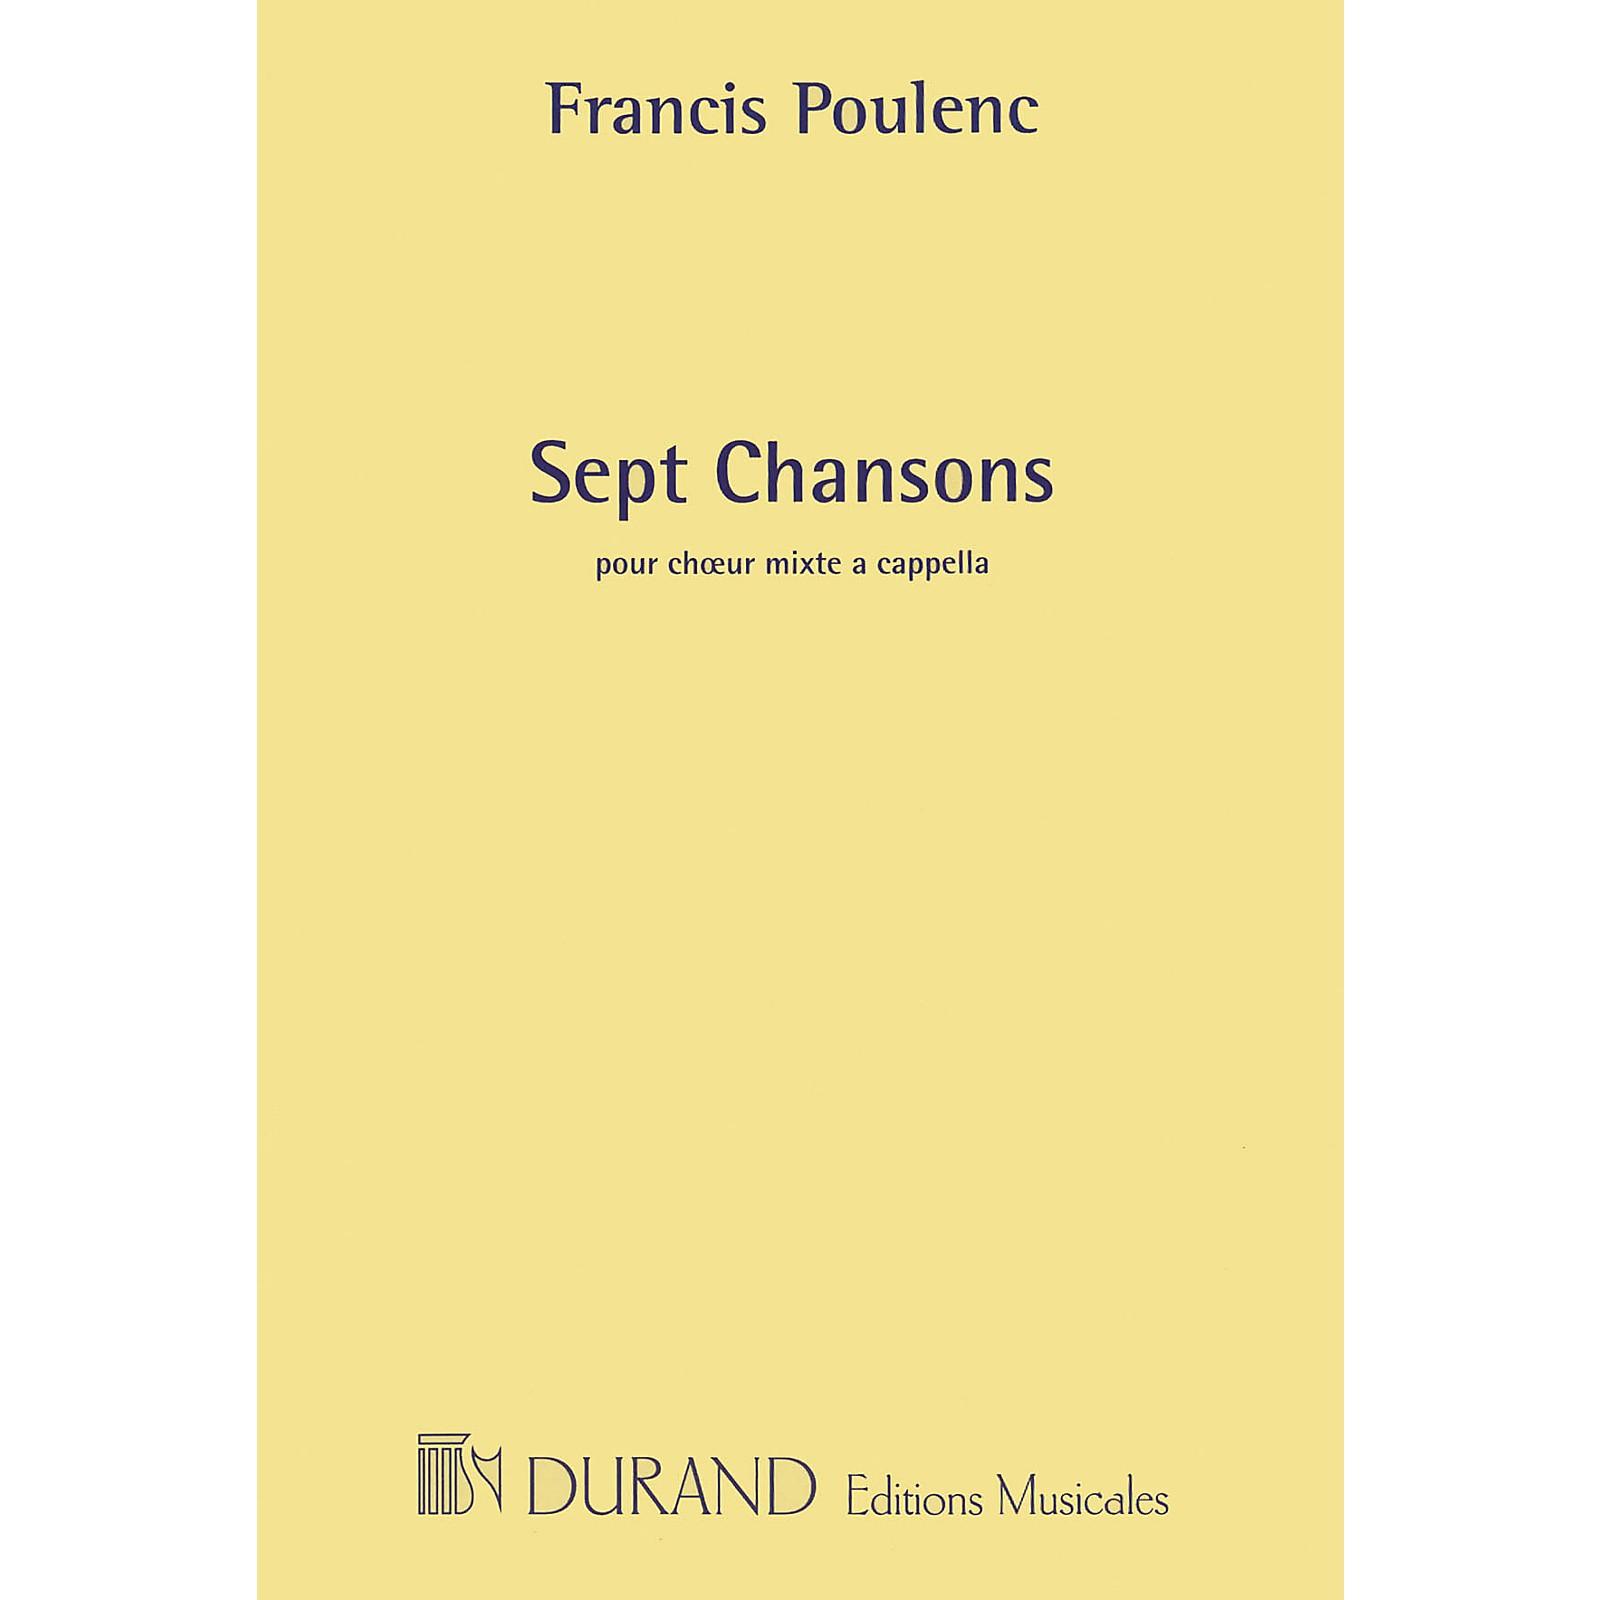 Editions Durand 7 Chansons (SATB a cappella chorus) SATB a cappella Composed by Francis Poulenc